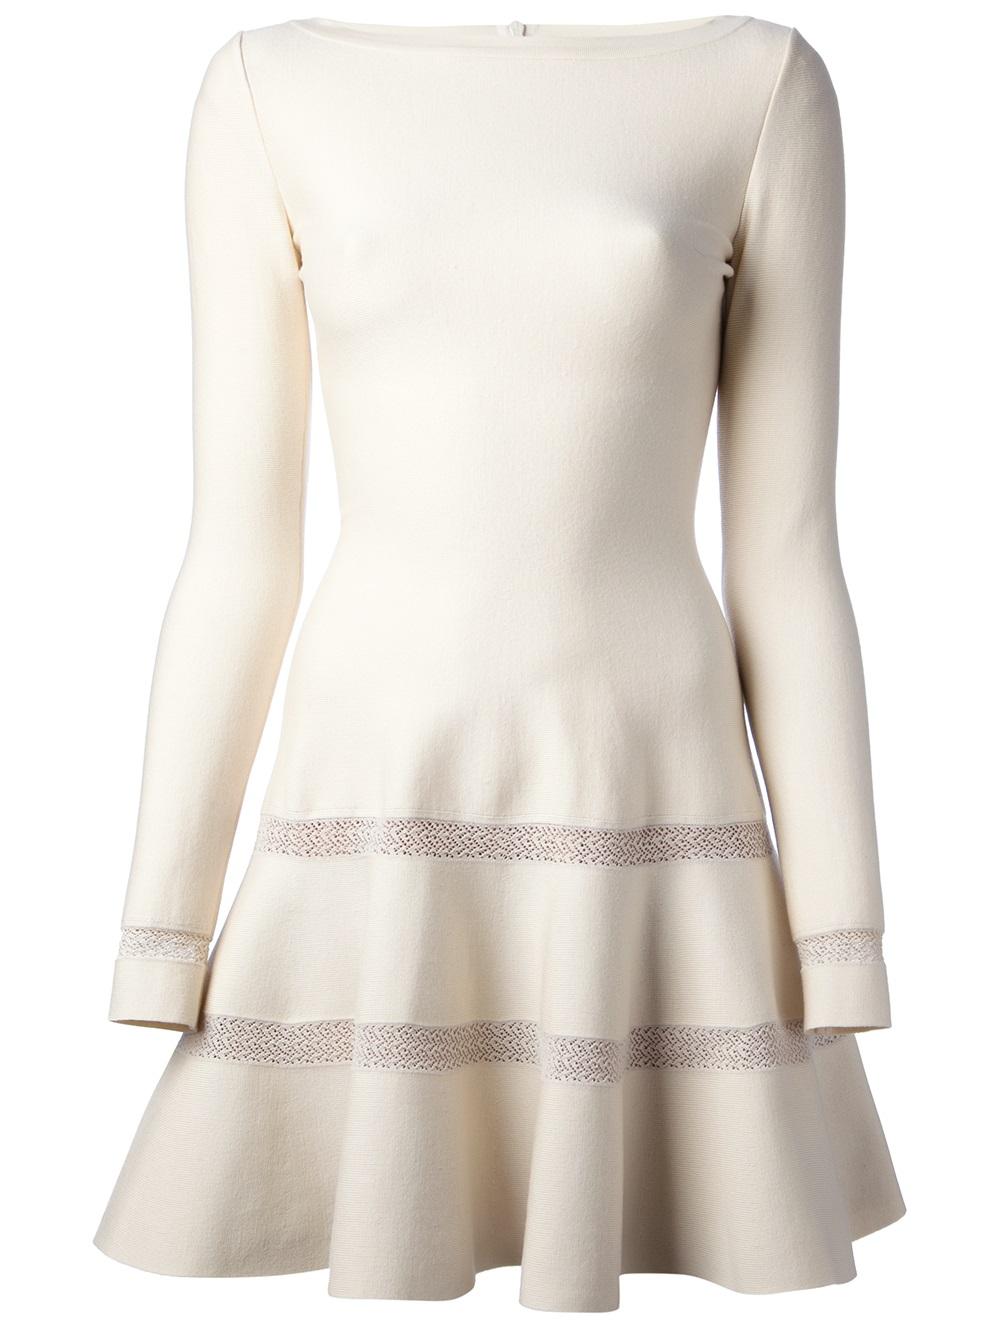 5b63603fa7c Alaïa Flared Dress in White - Lyst